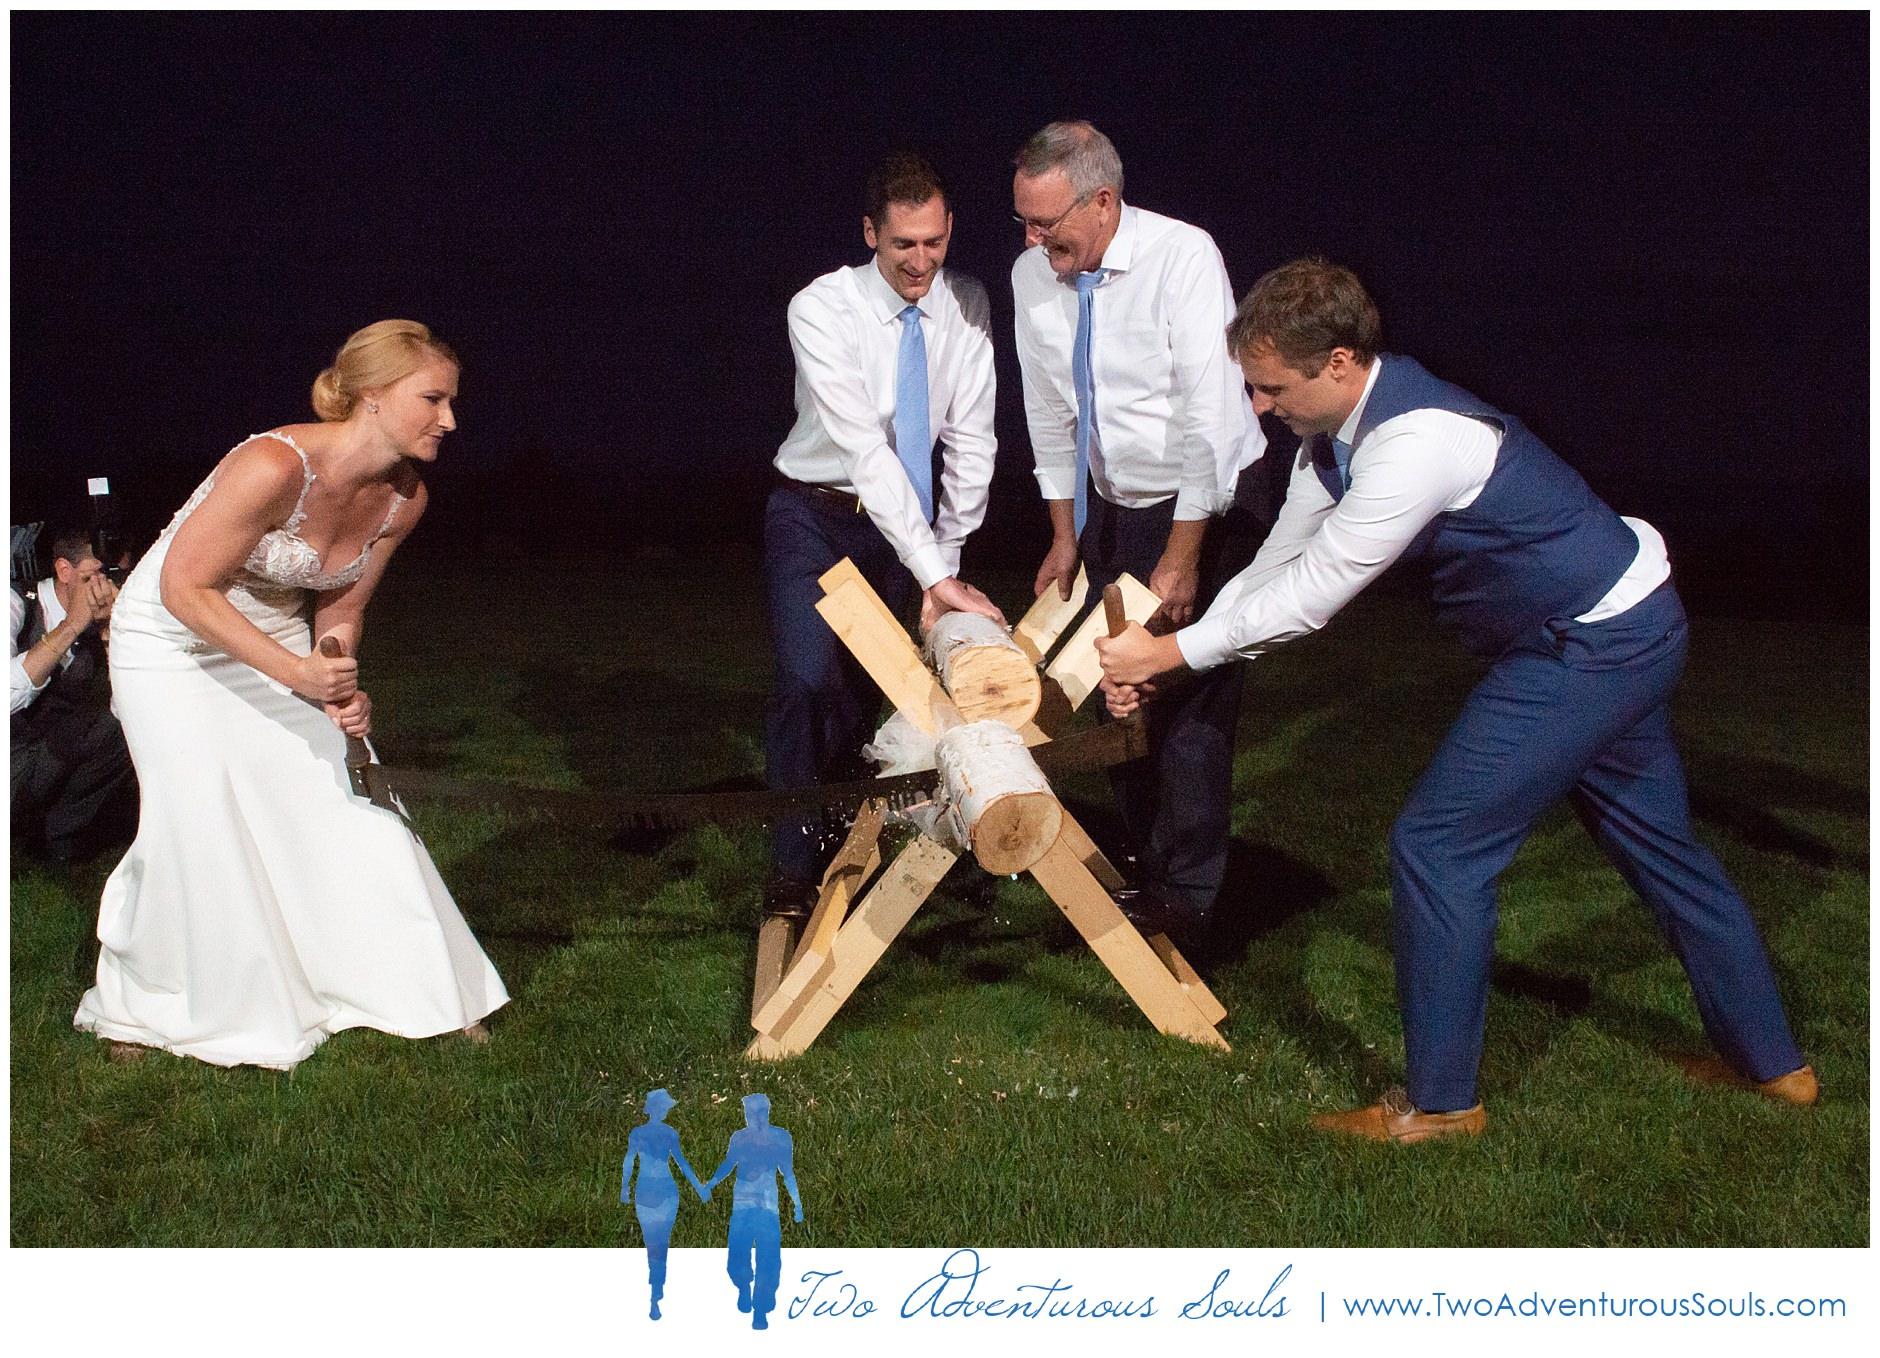 Maine Wedding Photographers, Point Lookout Wedding Photographers, Maine Elopement Photographers, Two Adventurous Souls-0080419_0066.jpg